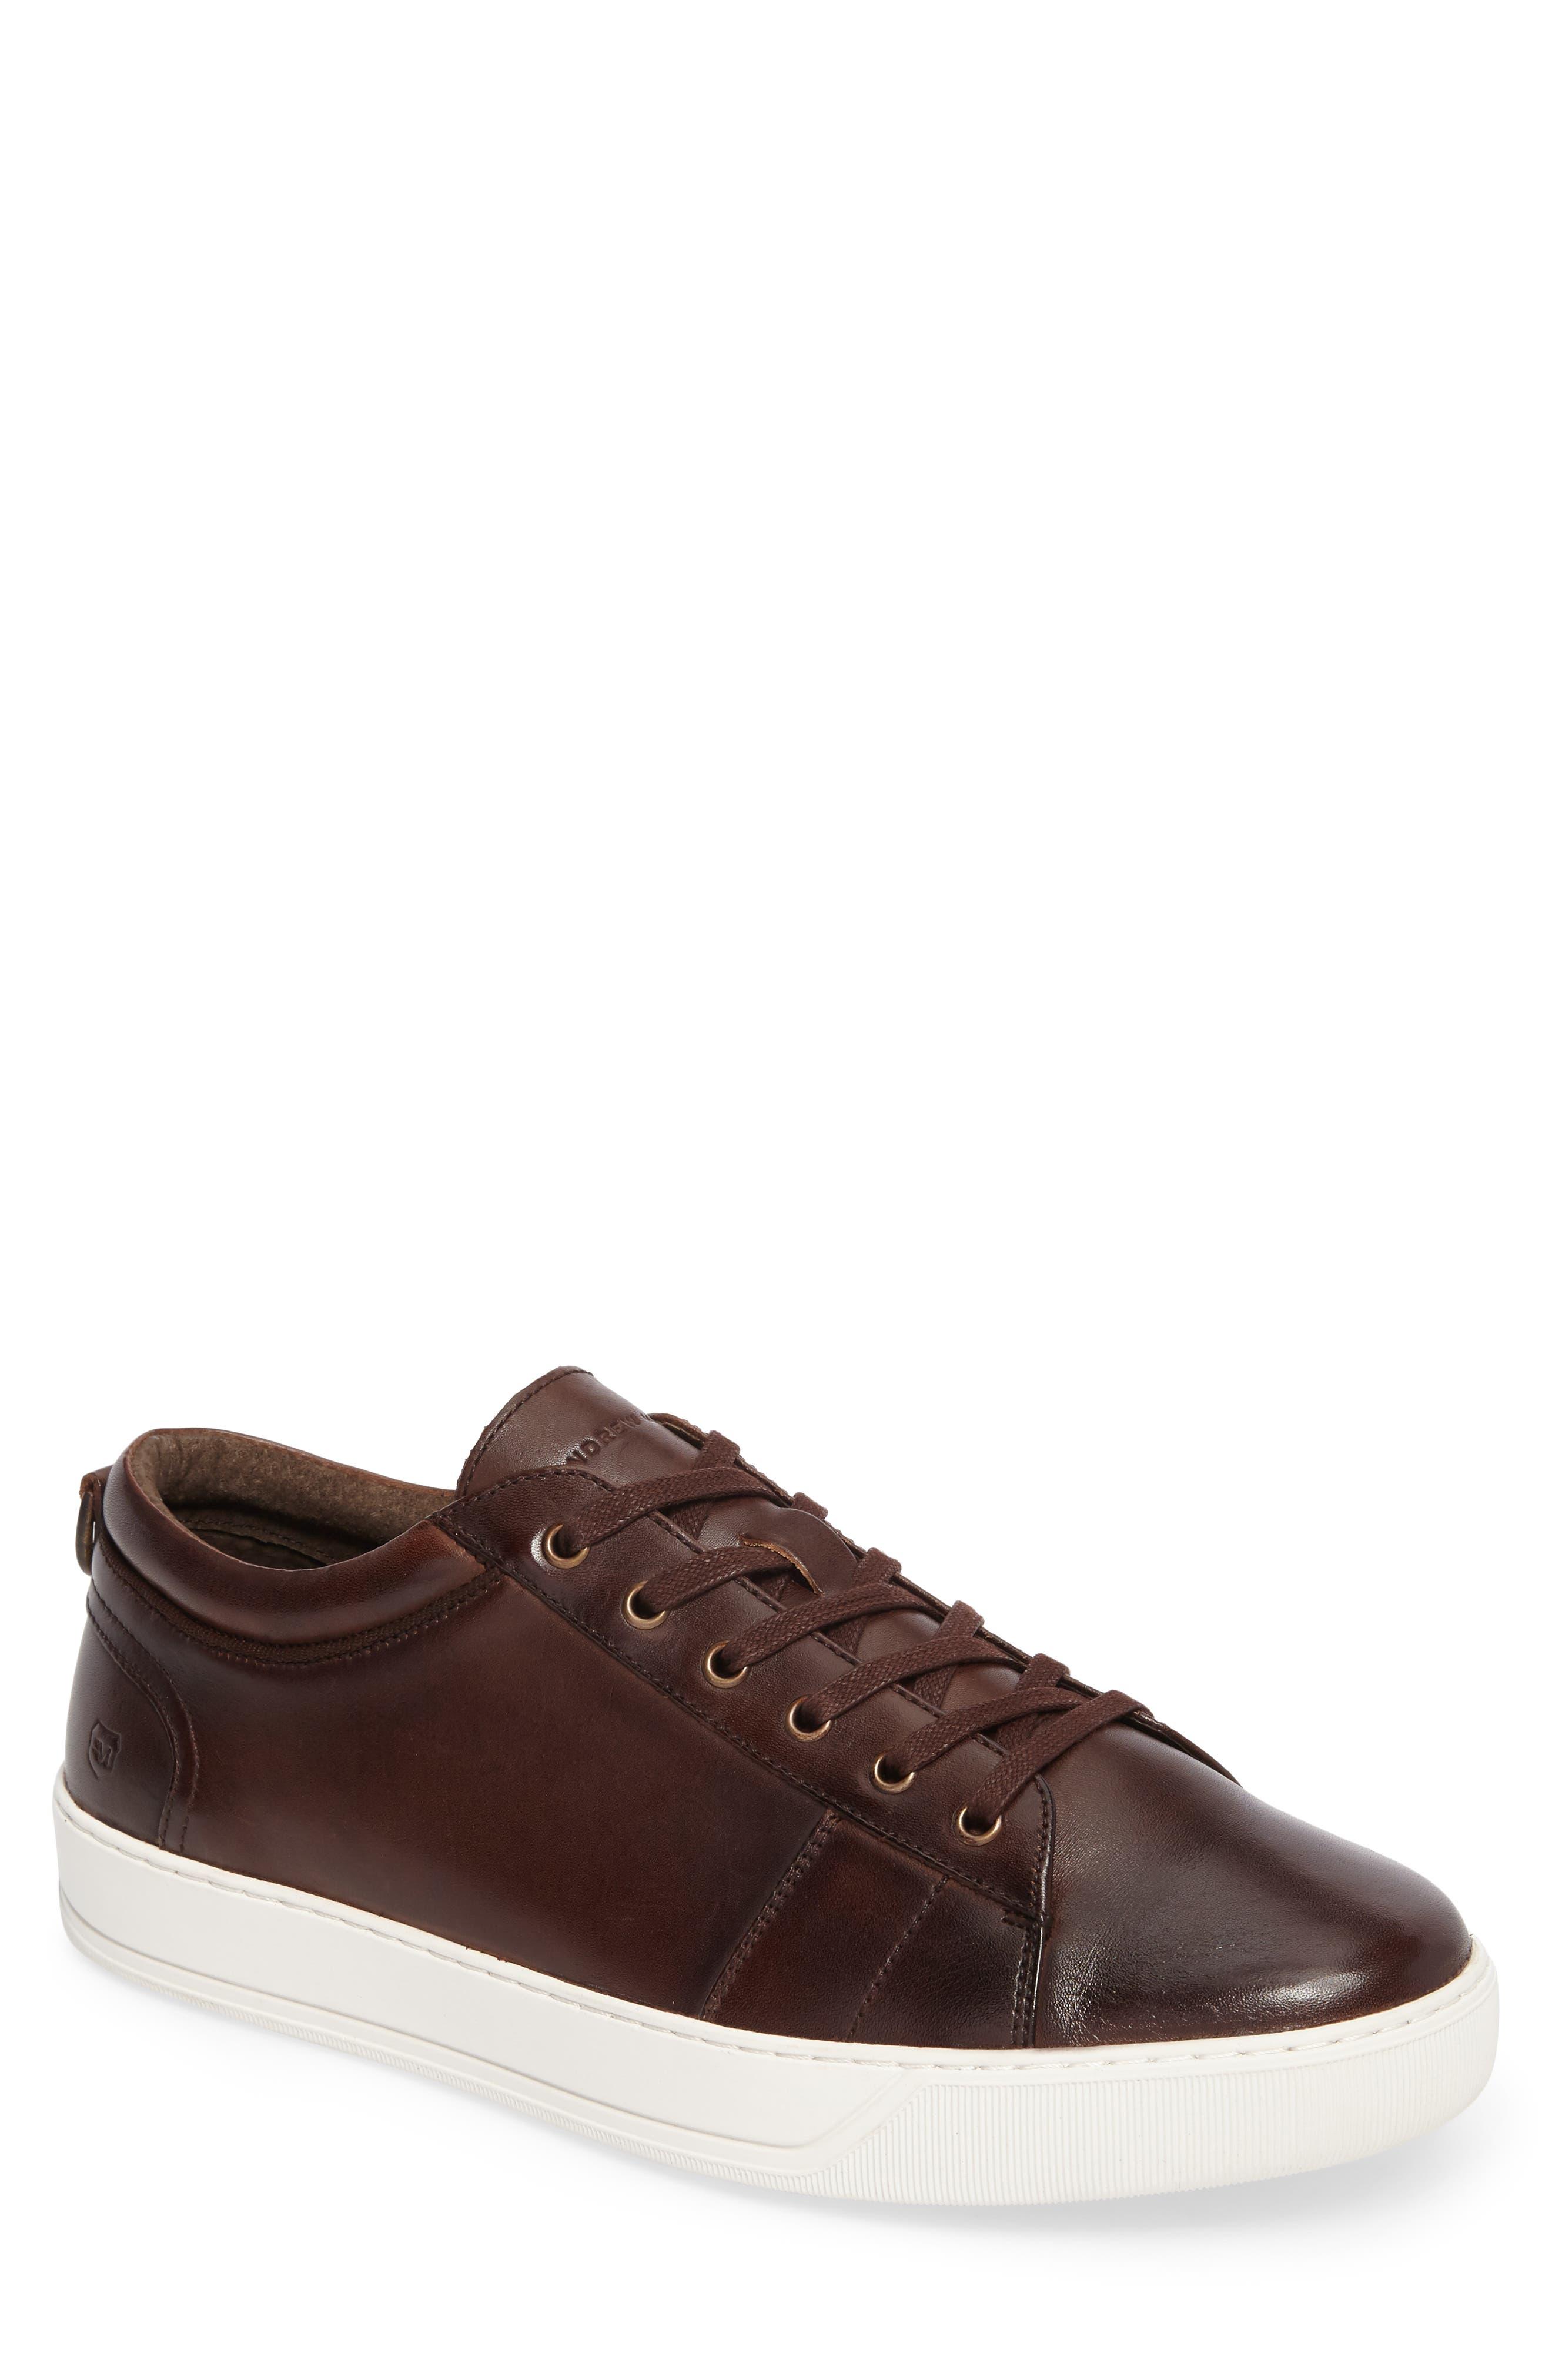 'Darwood' Sneaker,                         Main,                         color, Dark Brown/ White Leather